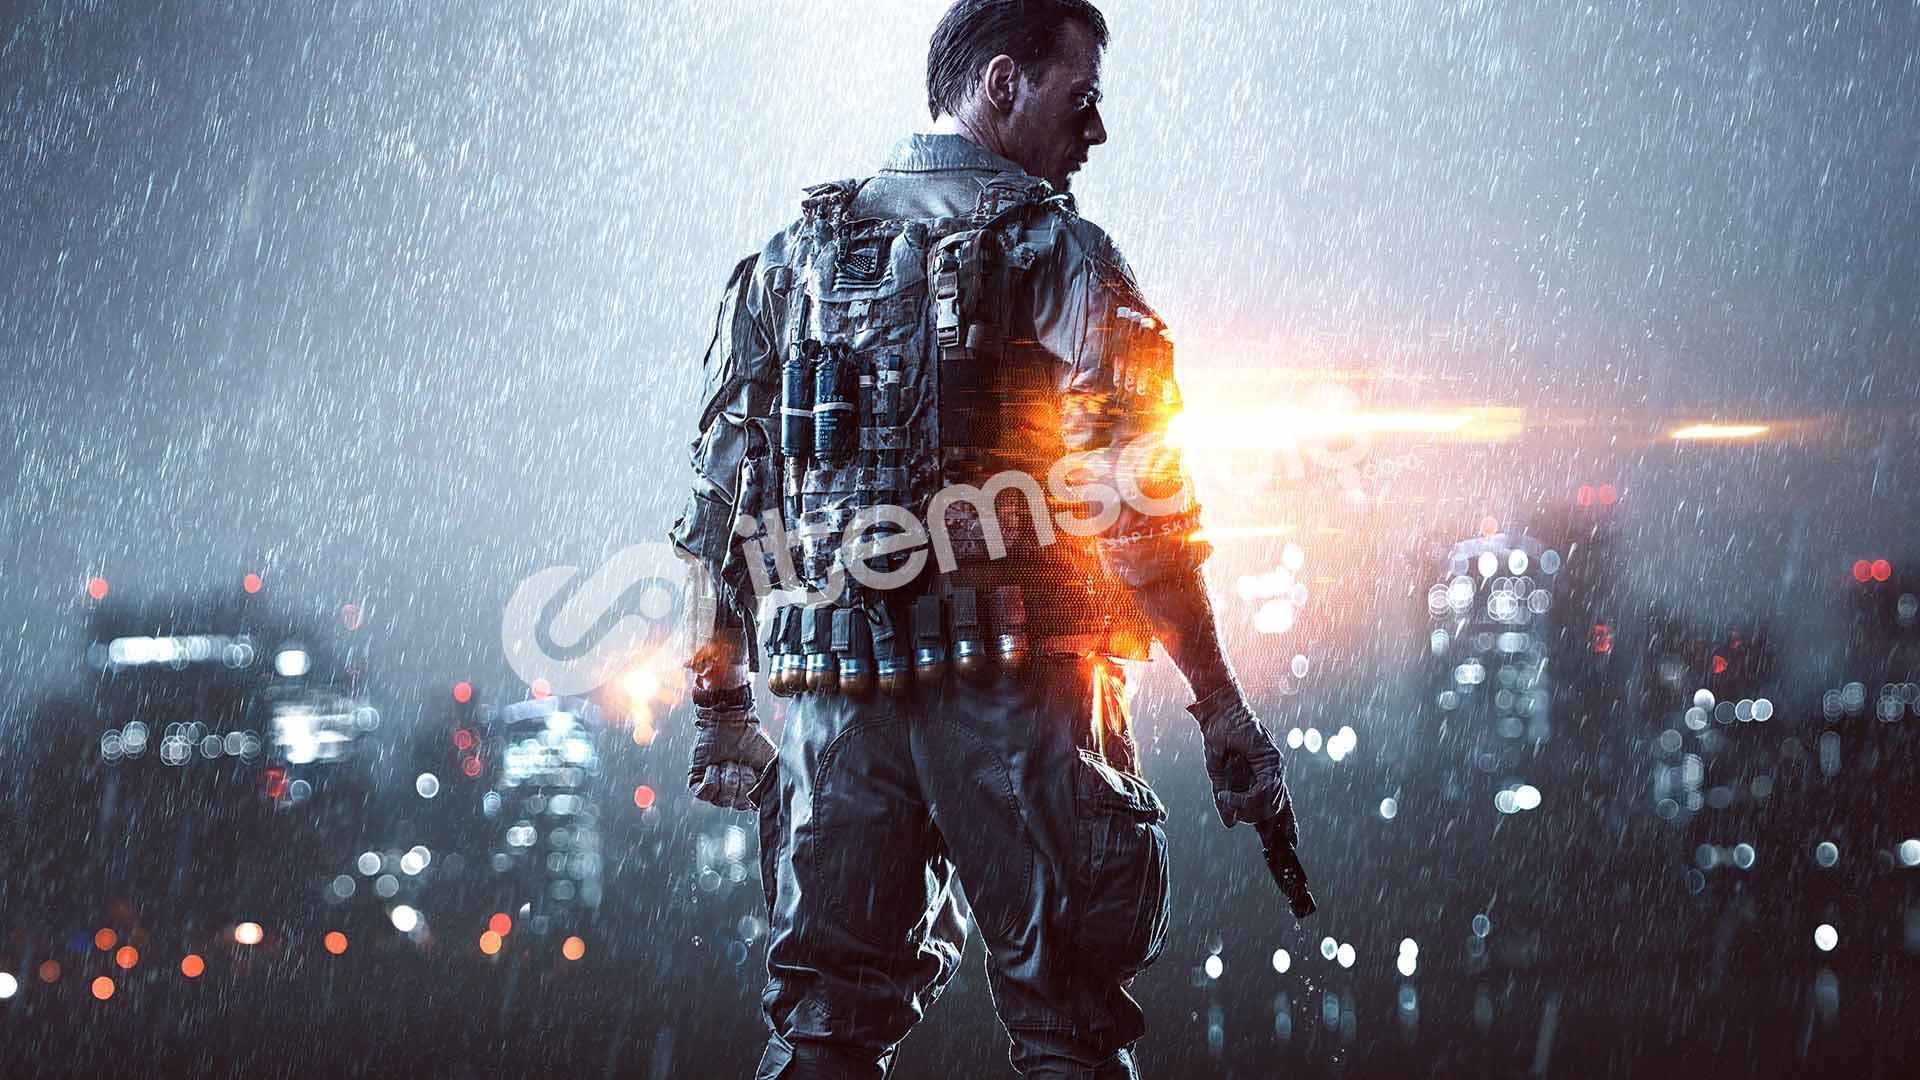 (ONLİNE) Battlefield 4 + HEDİYE + GARANTİ